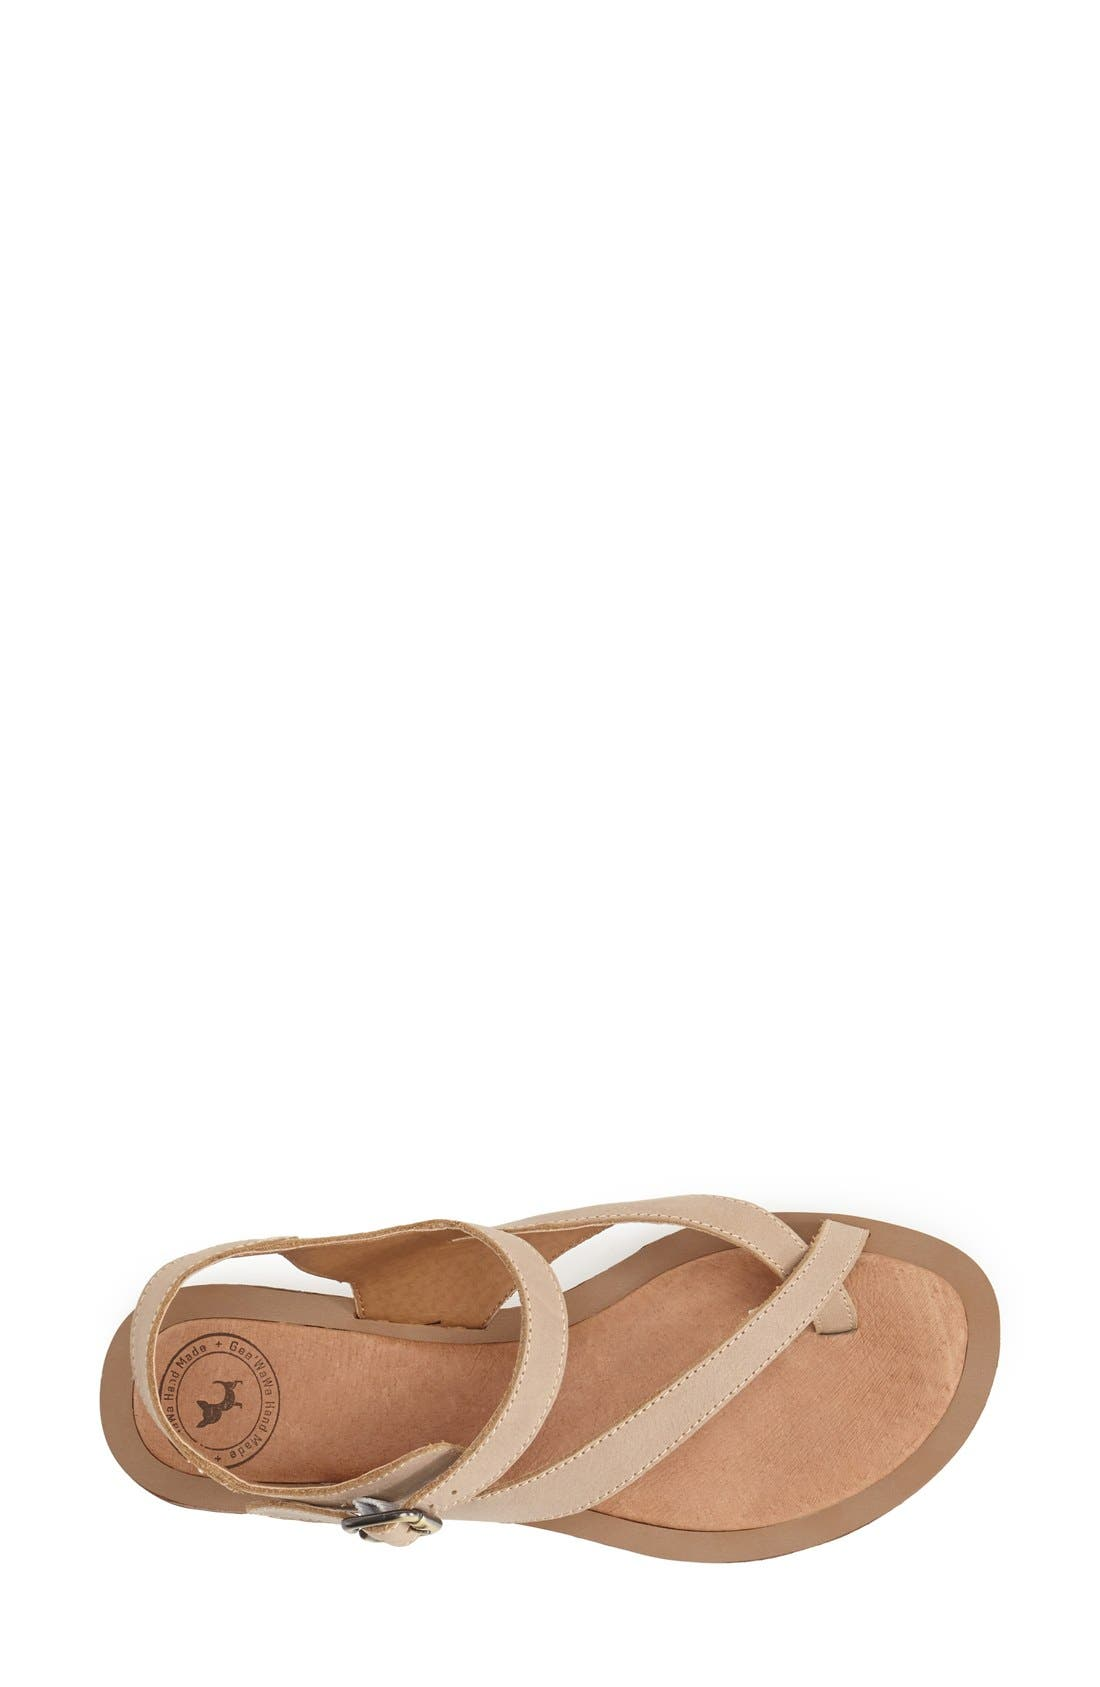 Alternate Image 3  - Gee WaWa 'Montana' Leather Sandal (Women)